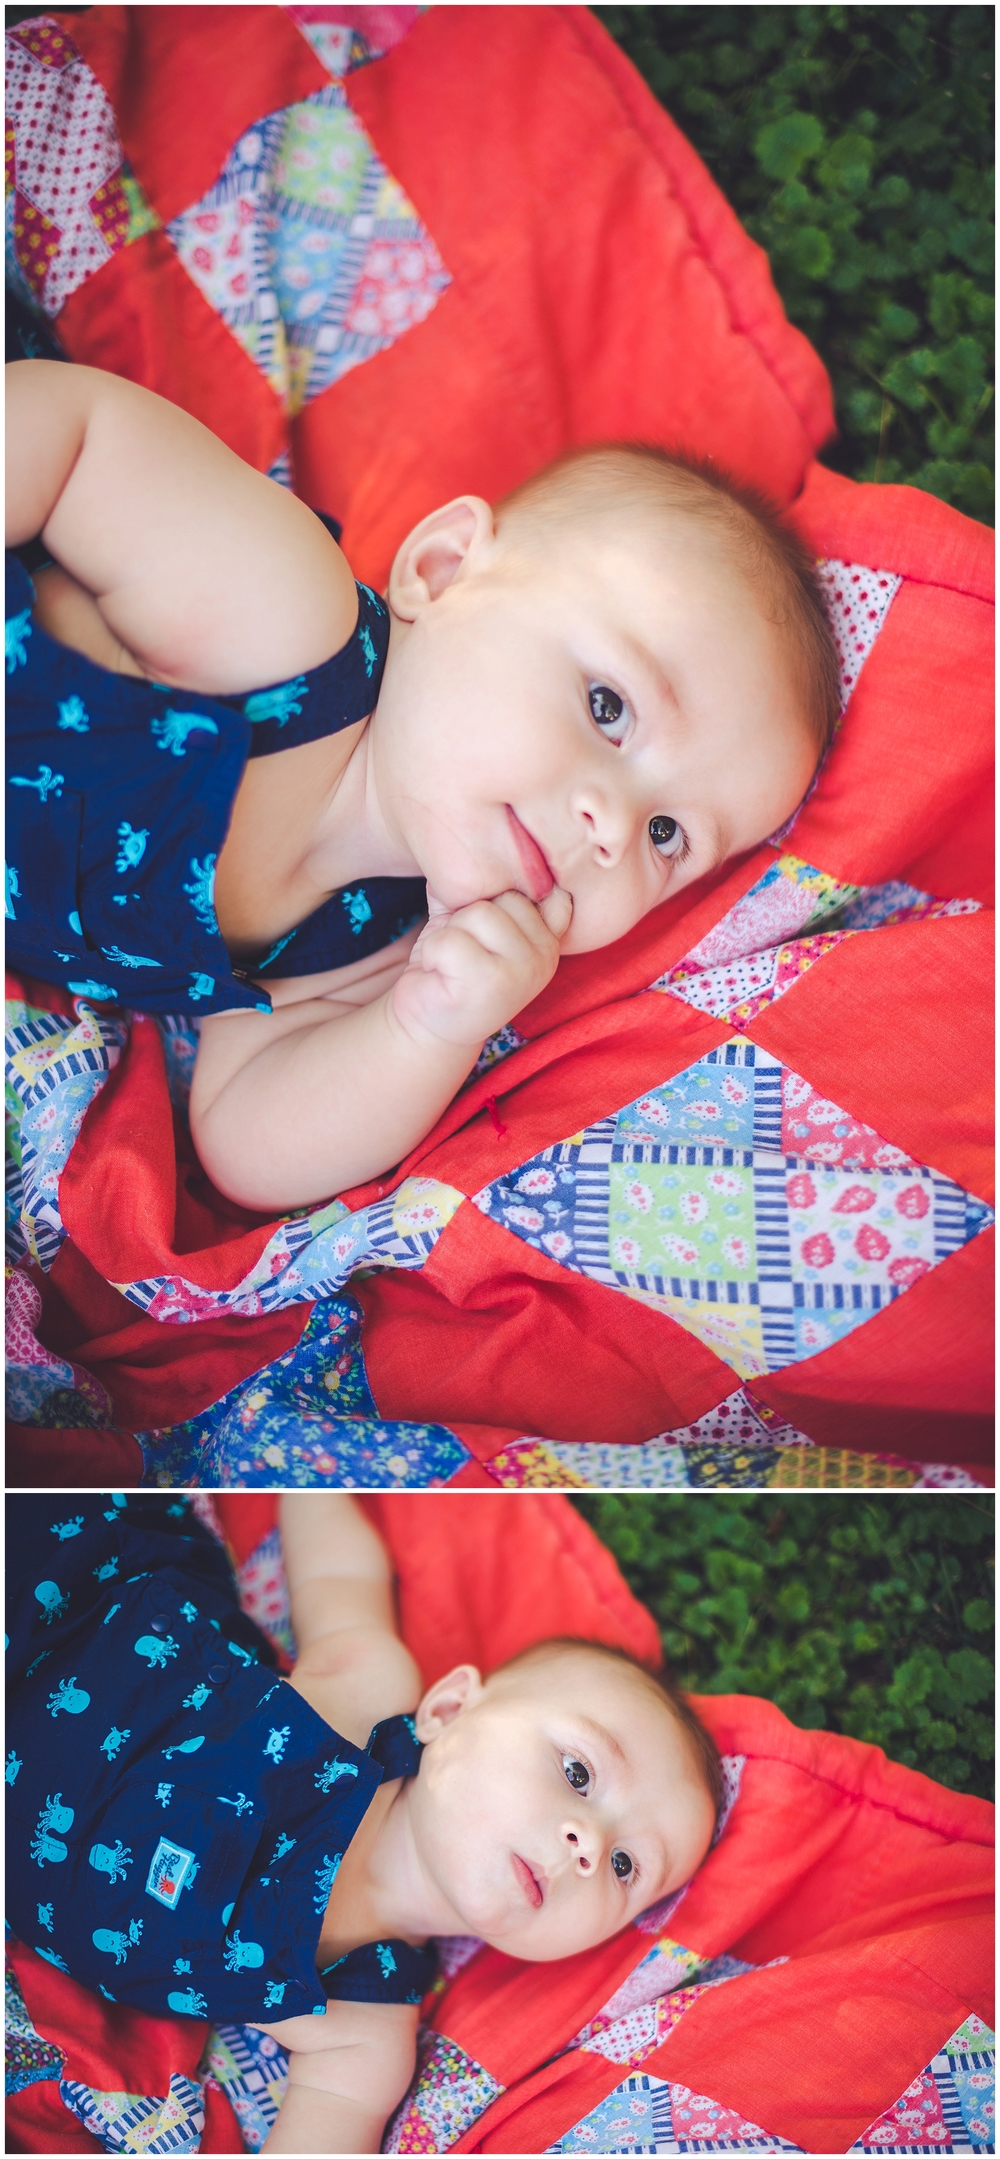 By Kara Photo-Family-Family Photography-Portrait Photography-Central Illinois Portrait Photographer-Jacksonville Illinois Children Photographer